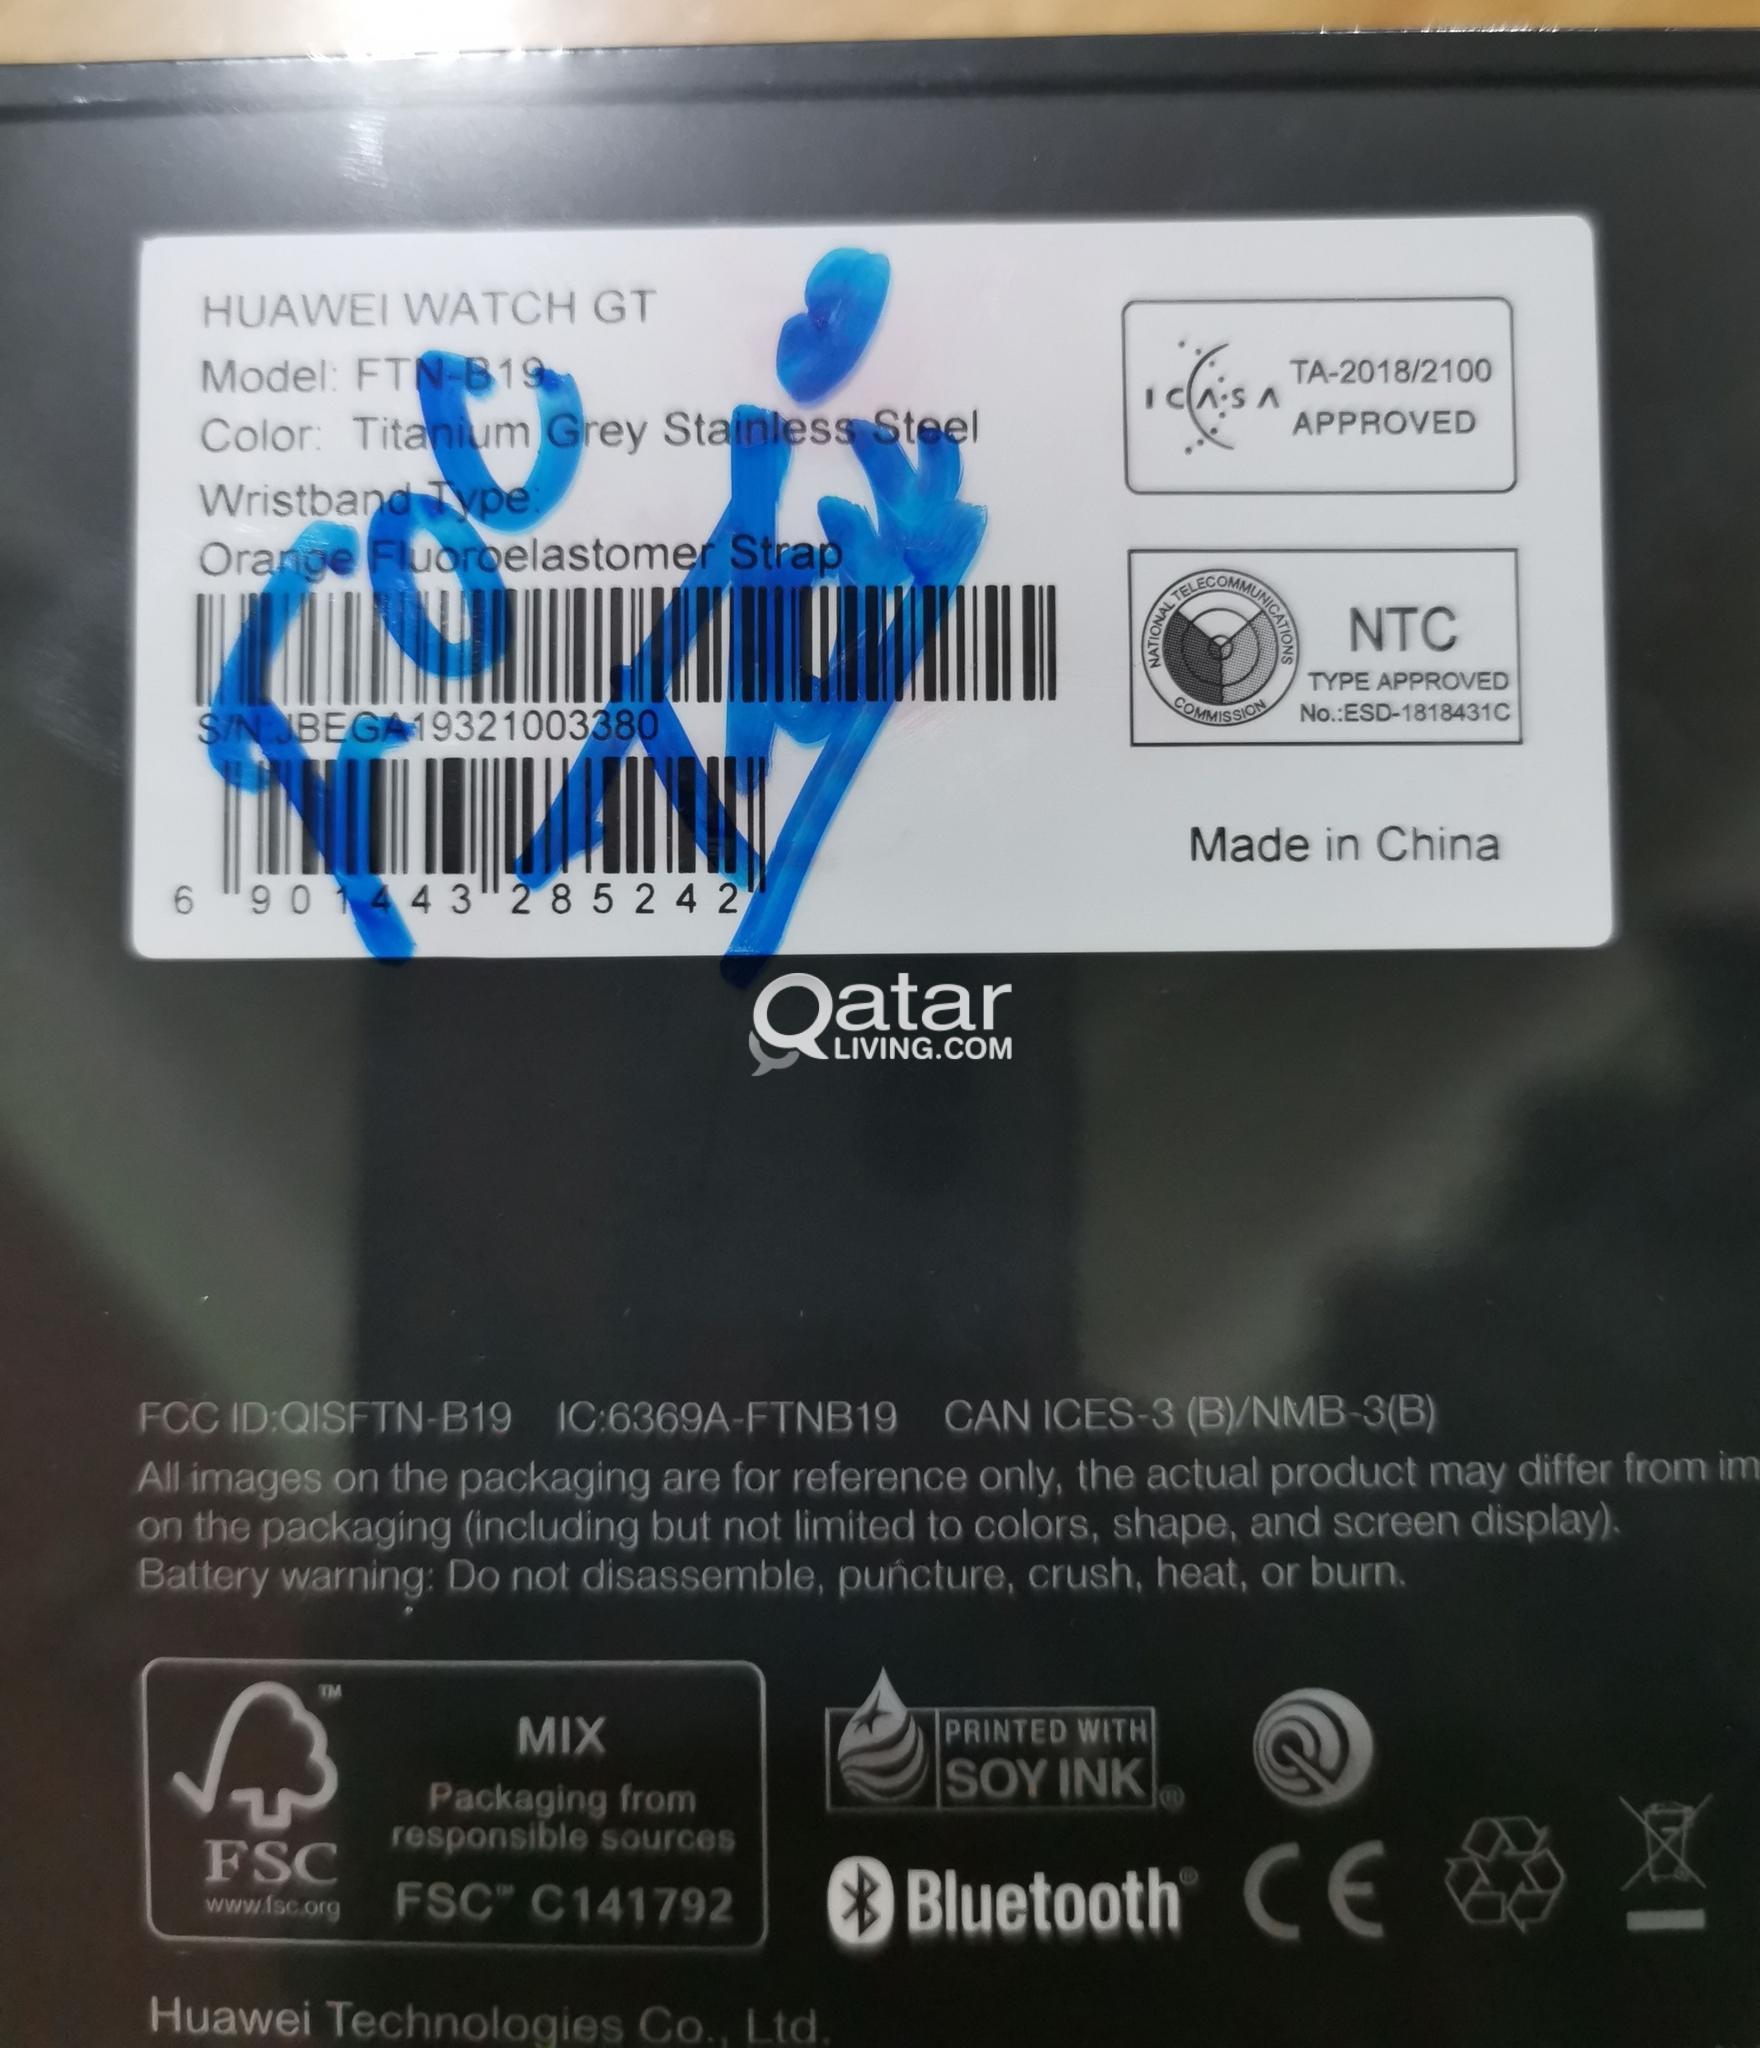 HUAWEI WATCH GT SEALED BOX | Qatar Living